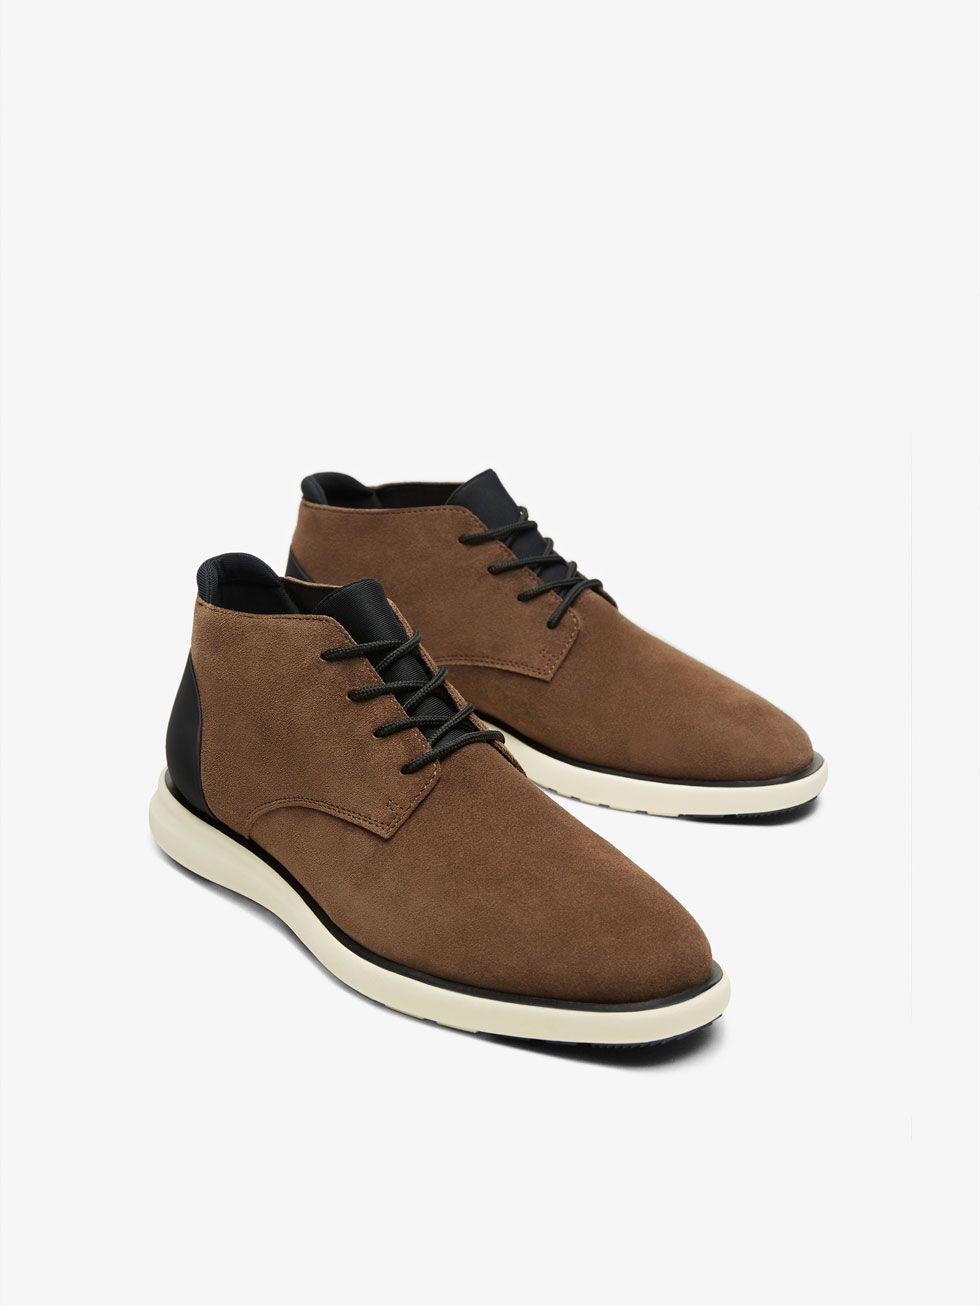 Zapatos marrones con velcro estilo militar para hombre gq6S5yJ